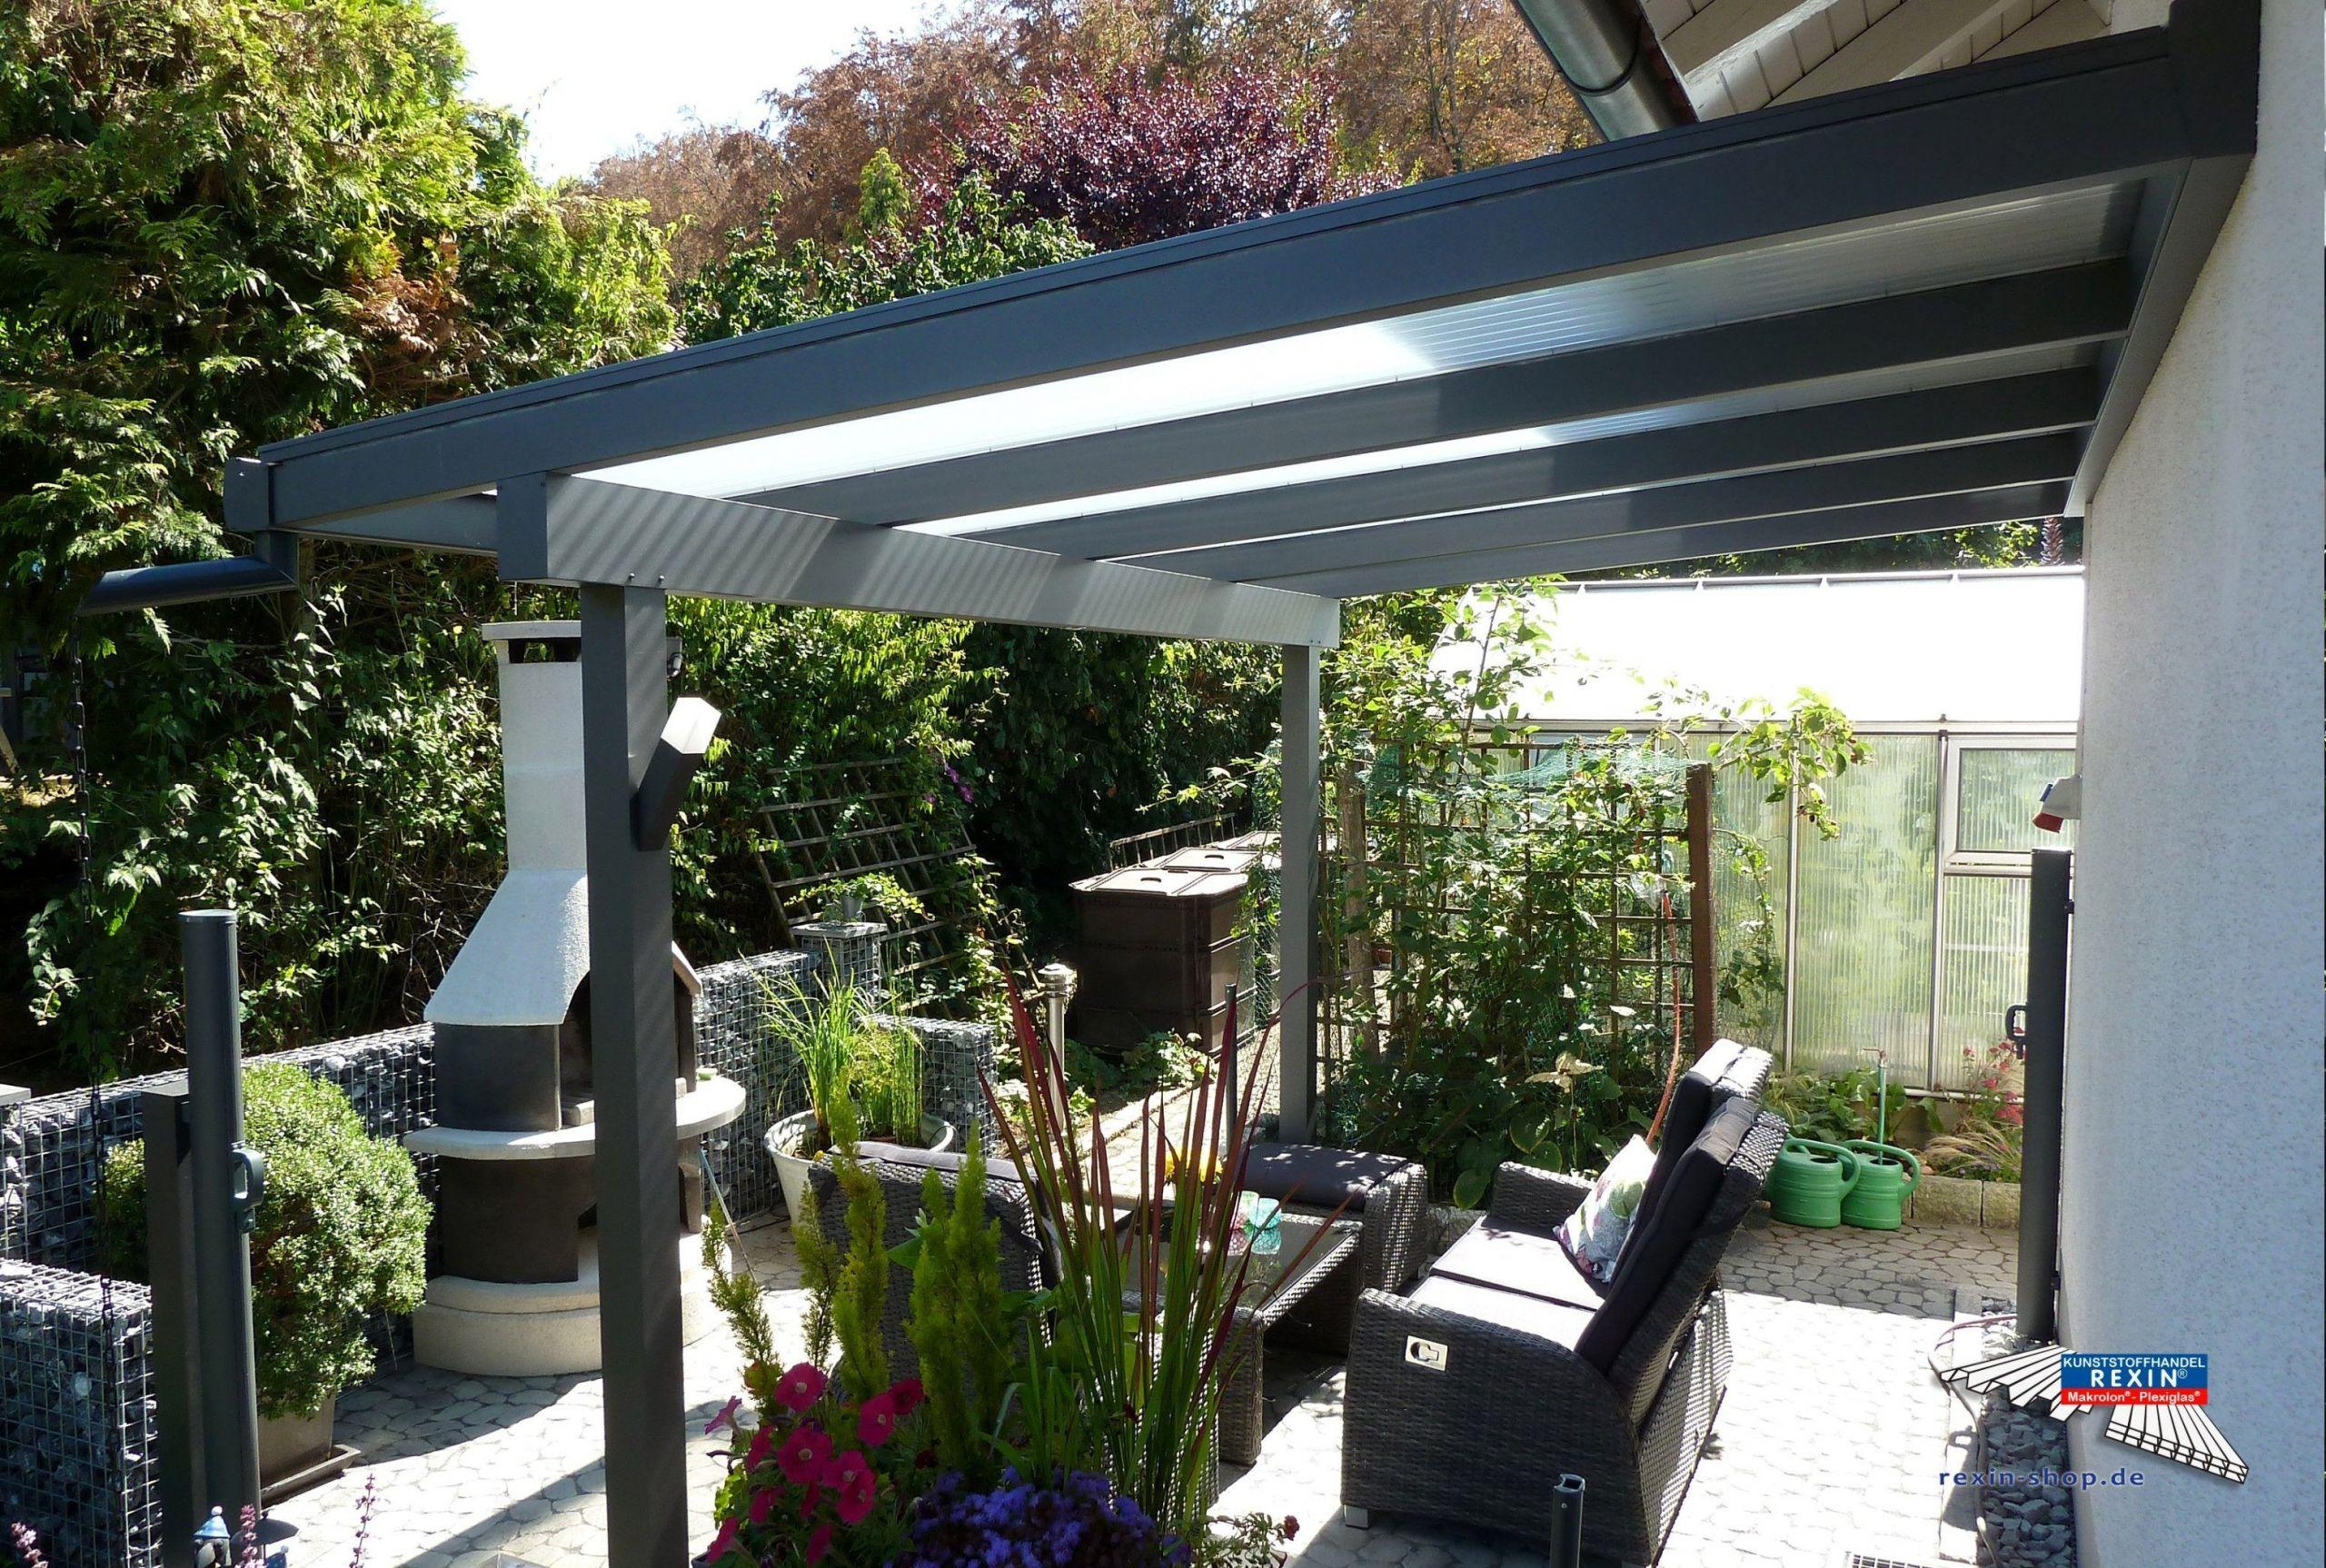 meuble de veranda meuble de terrasse beau meubles de terrasse elegant idee de terrasse of meuble de veranda